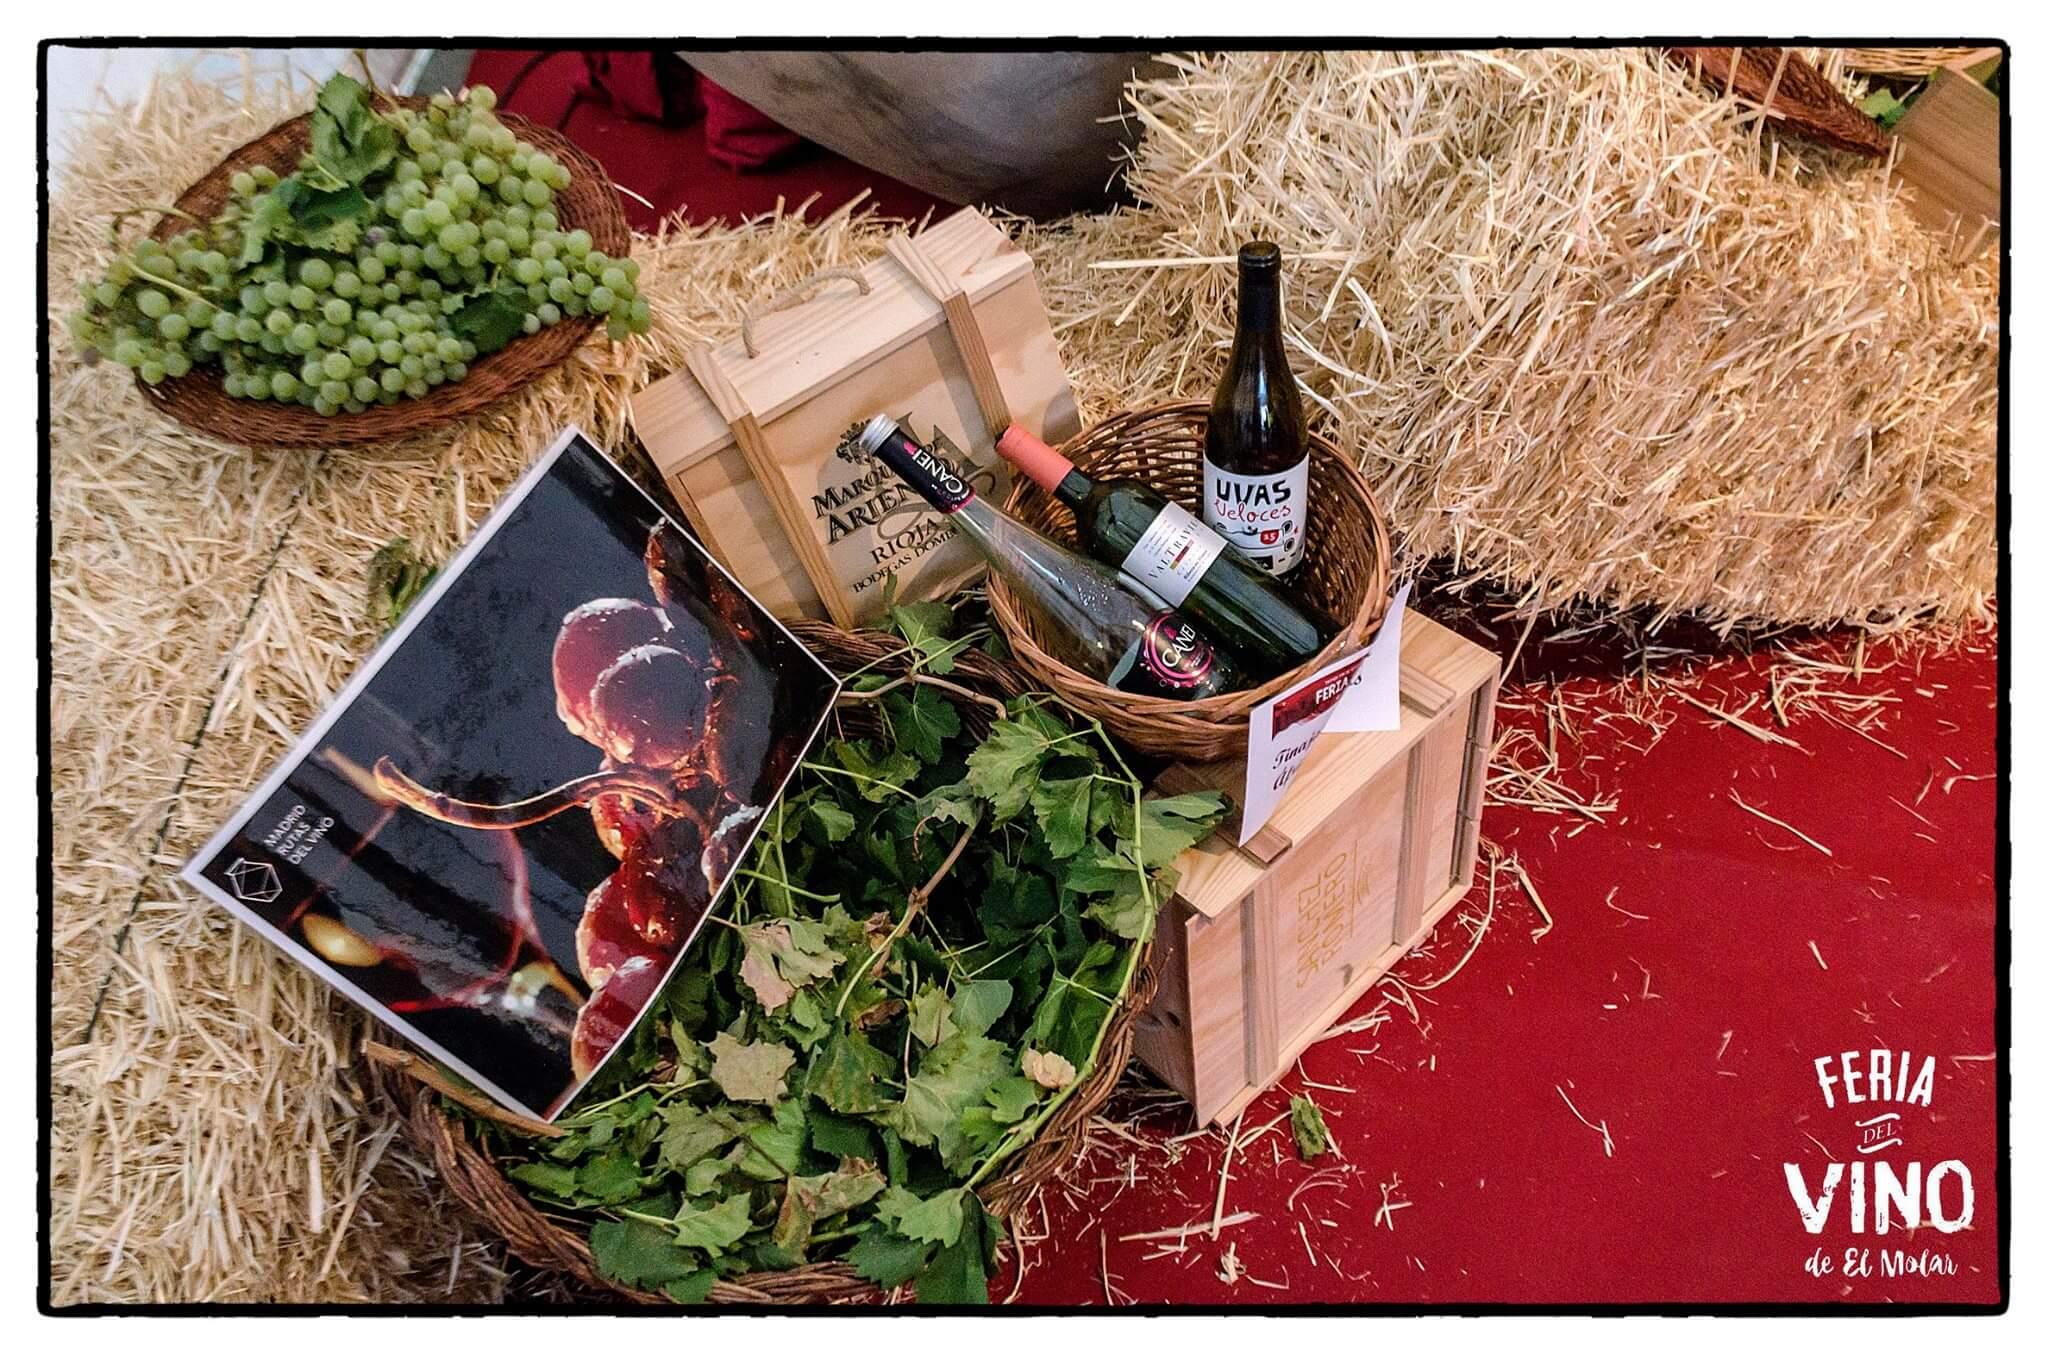 Feria del vino